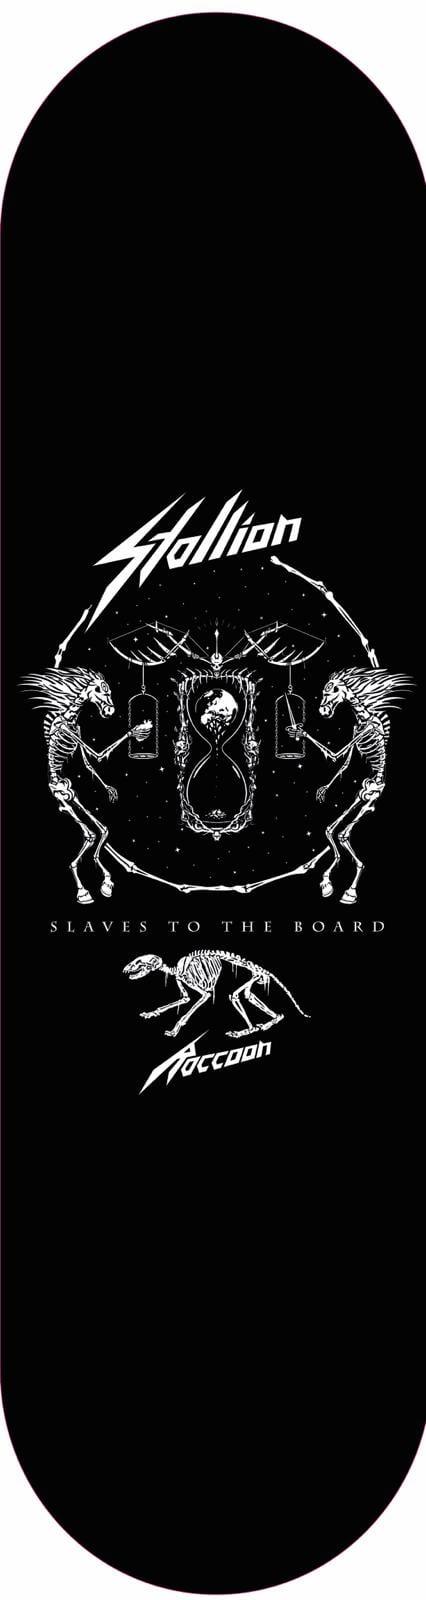 Skateboard Decks - Slaves of Time (Regular and with Corona Supporter -Bonus Package)